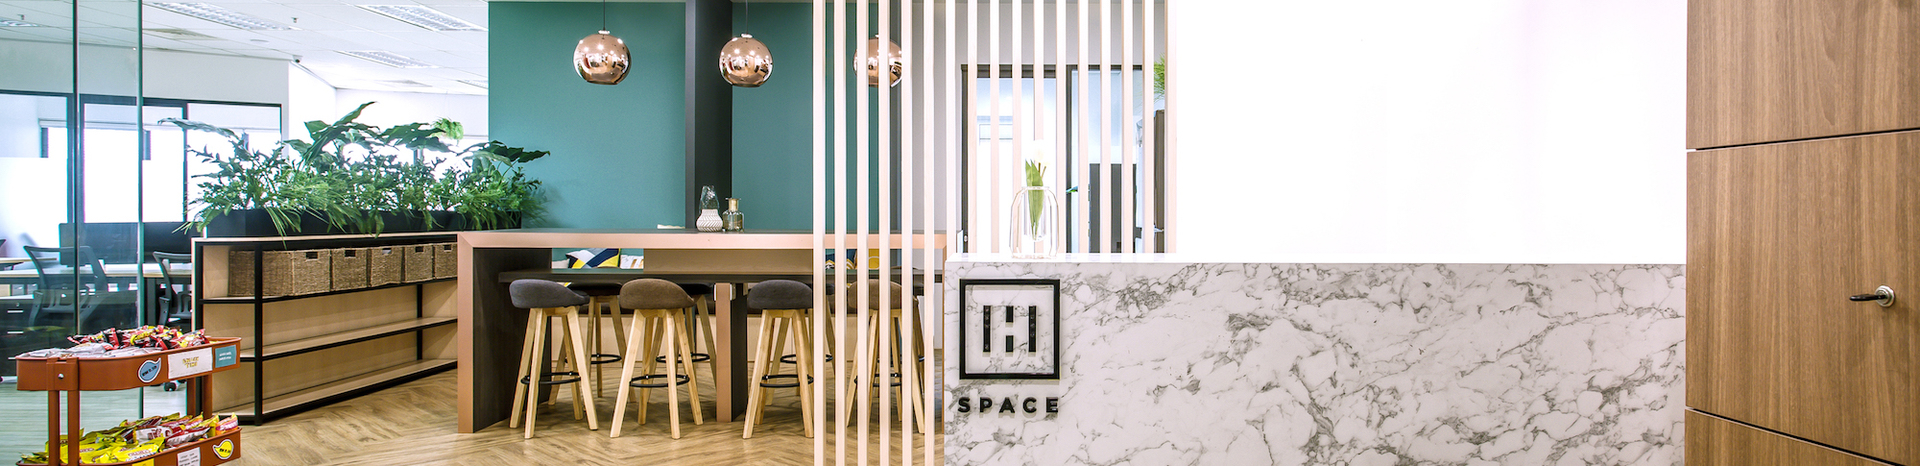 H Space - Bandar Utama